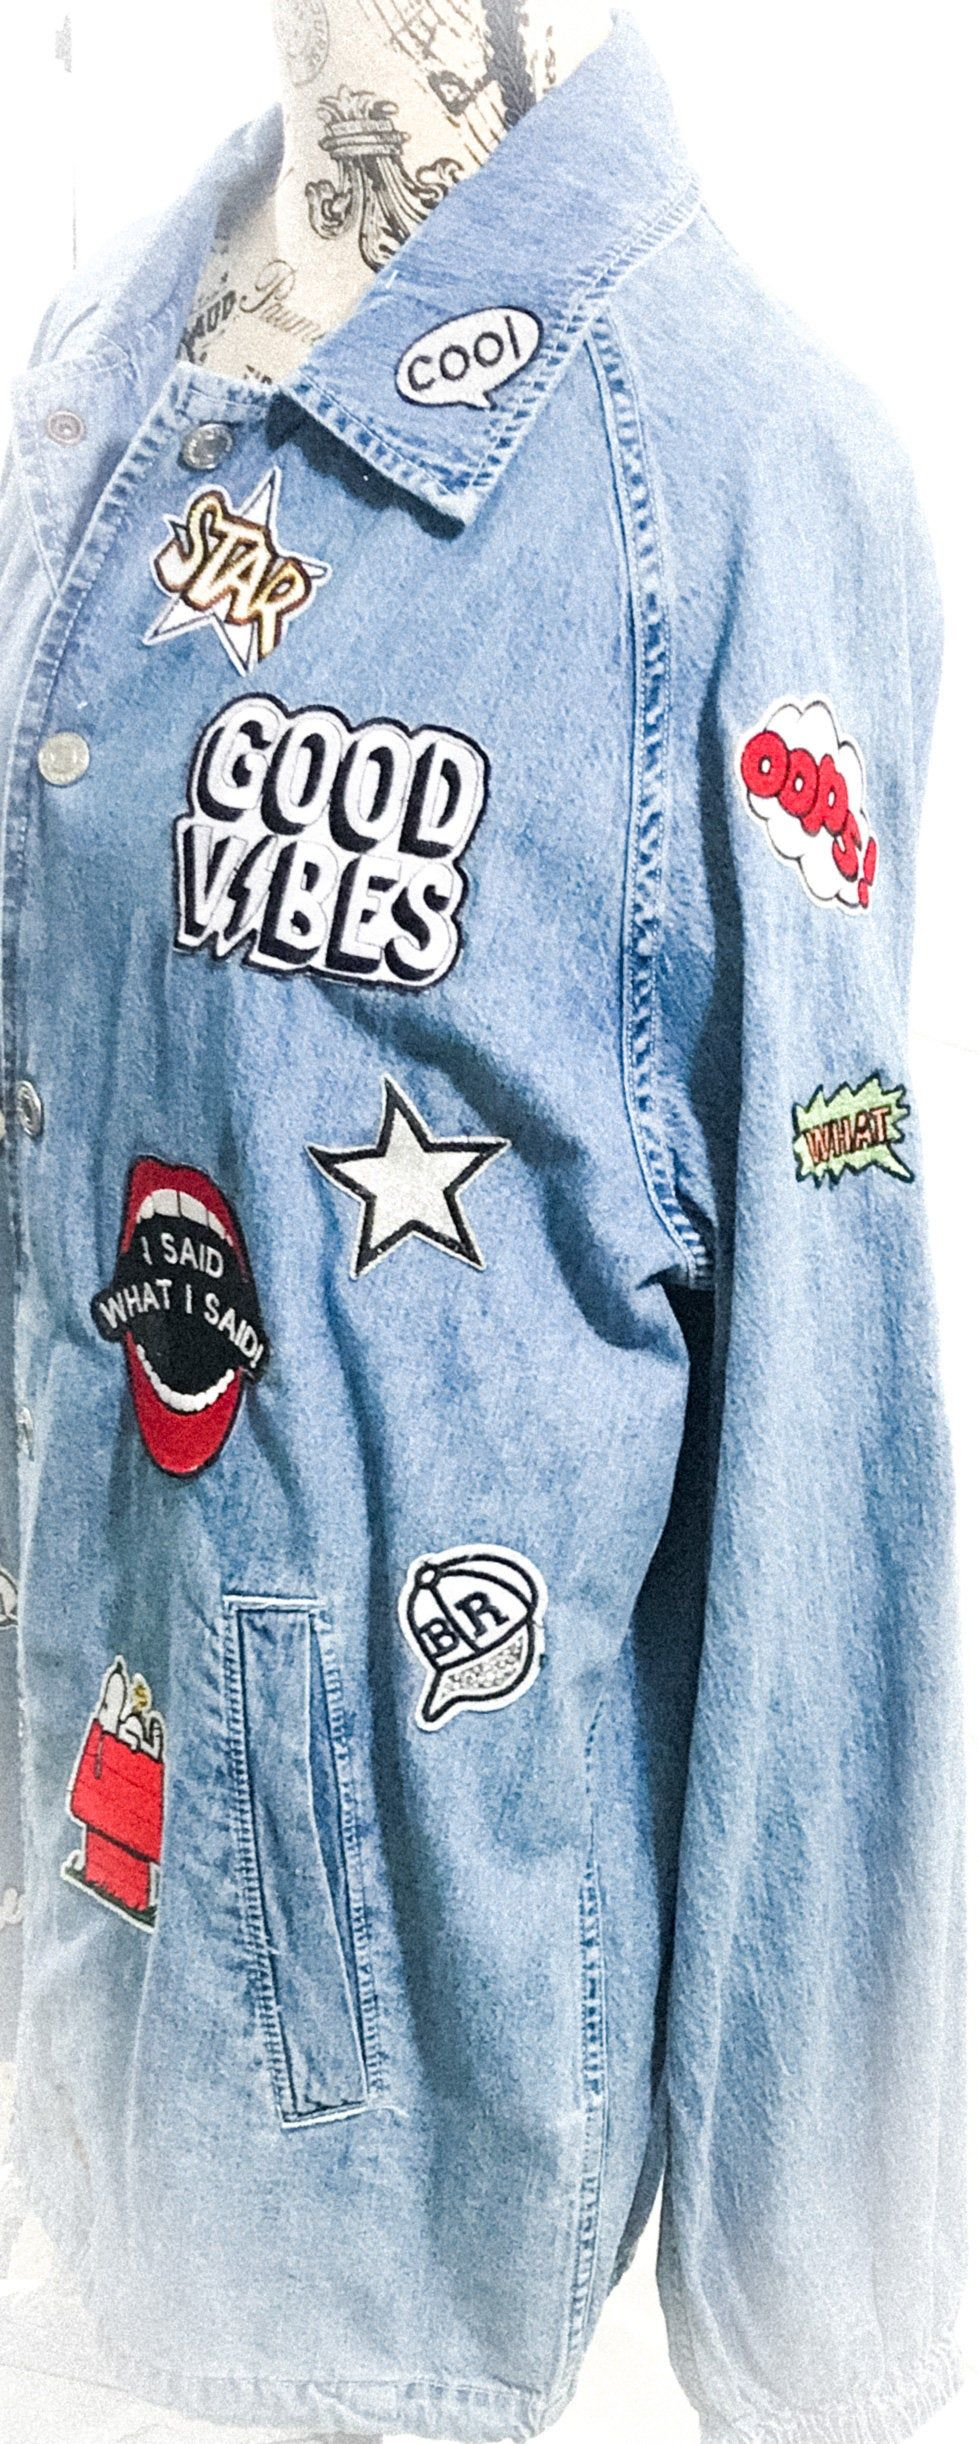 Rock Patch Jacket Rock Band Customized Jacket Coach Jacket Etsy In 2020 Diy Denim Jacket Pins On Denim Jacket Denim Jacket Patches [ 2444 x 979 Pixel ]